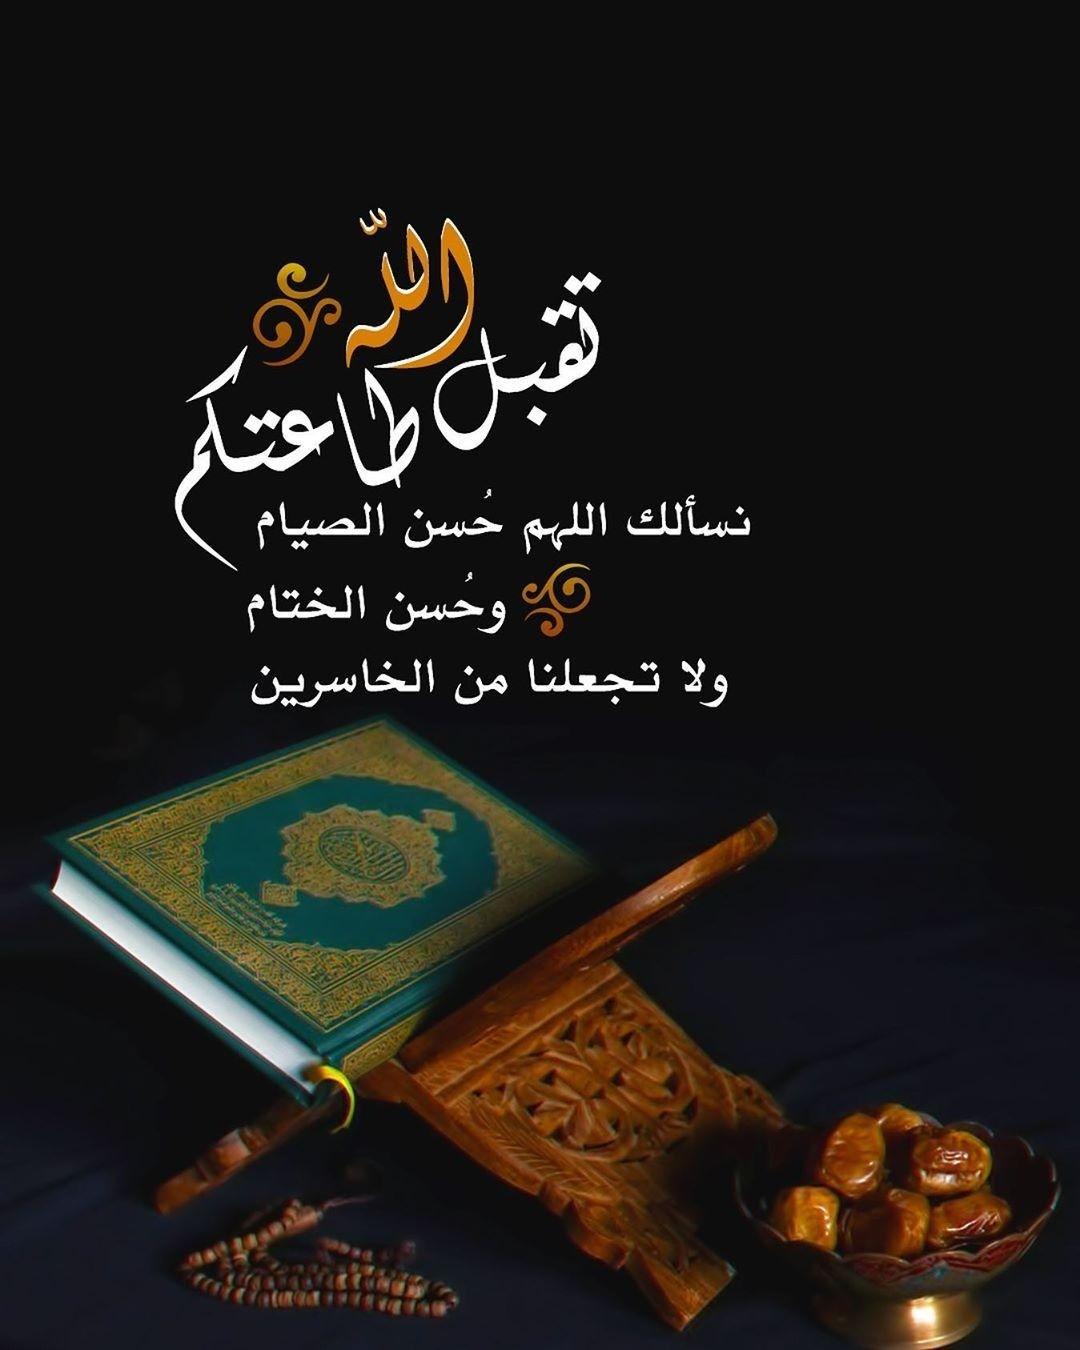 Pin By Khalid Nassim On أدعيه وأذكار In 2020 Ramadan Quotes Ramadan Ramadan Kareem